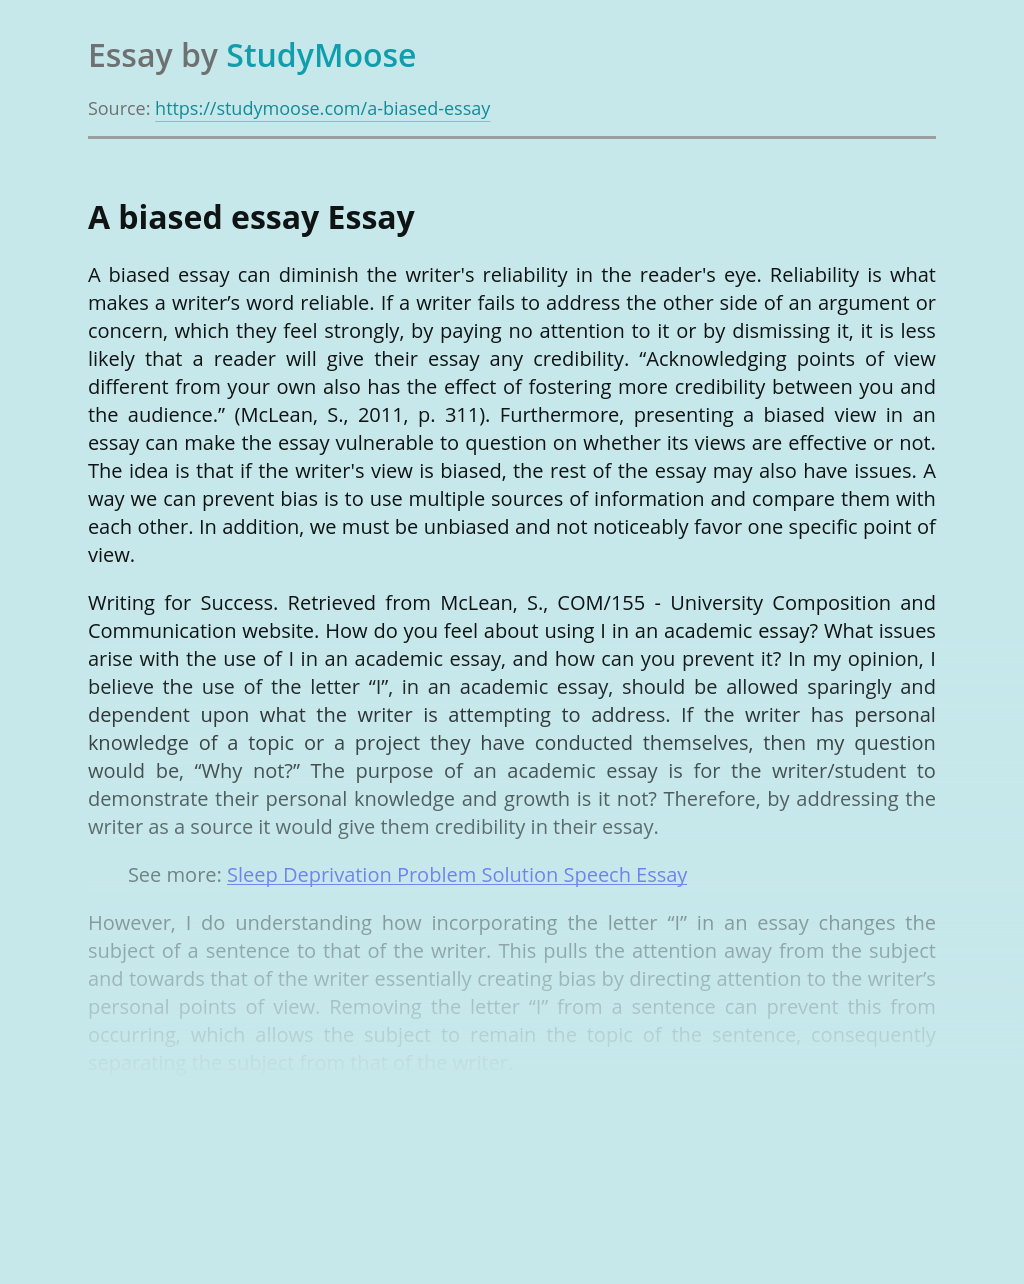 A biased essay